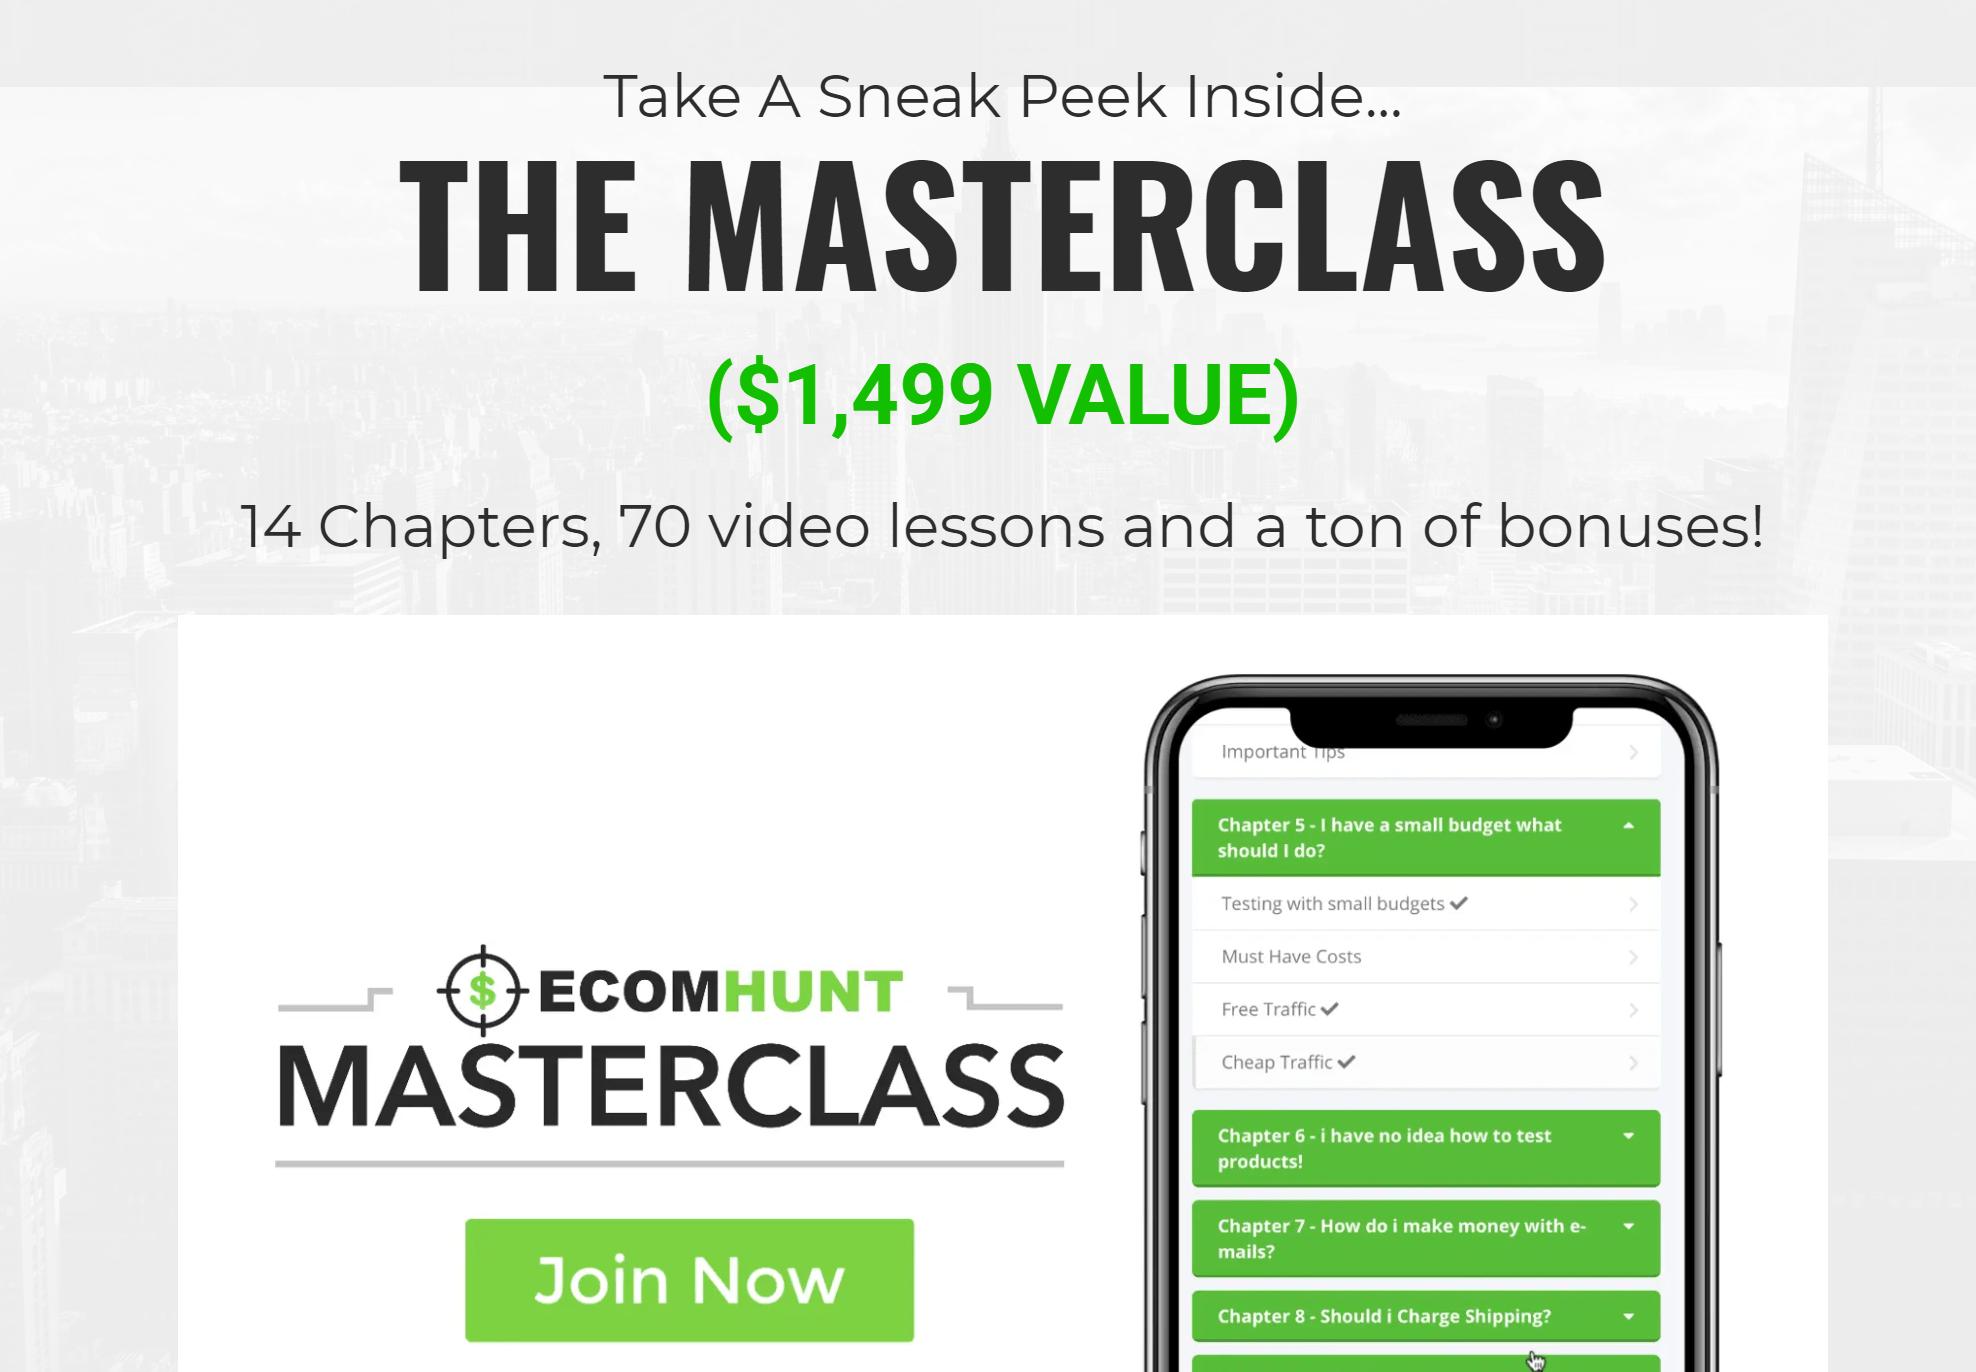 Ecomhunt masterclass reviews